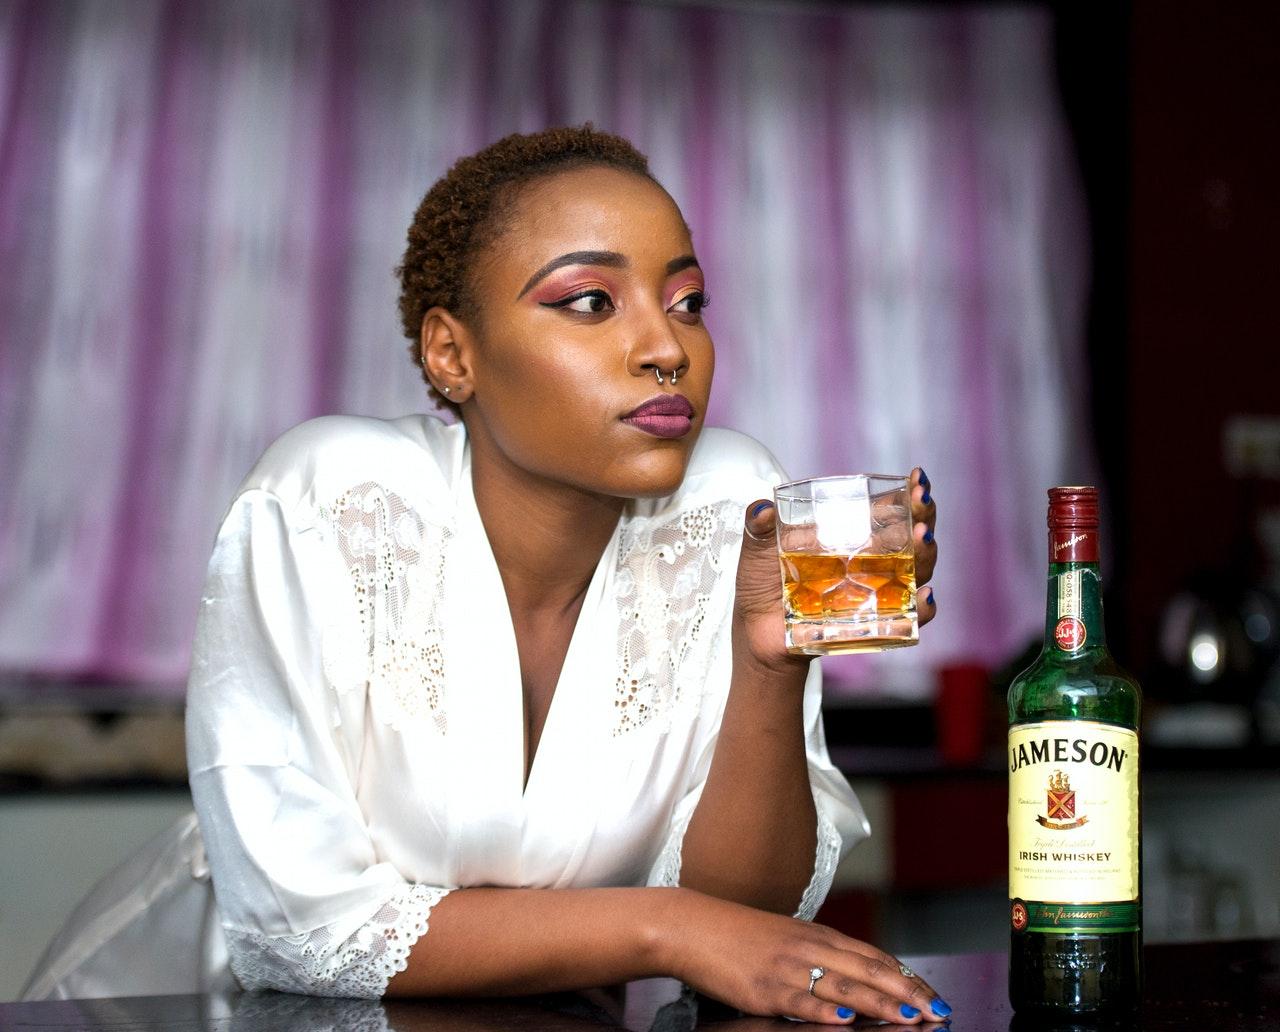 Frau trinkt Jameson Whisky